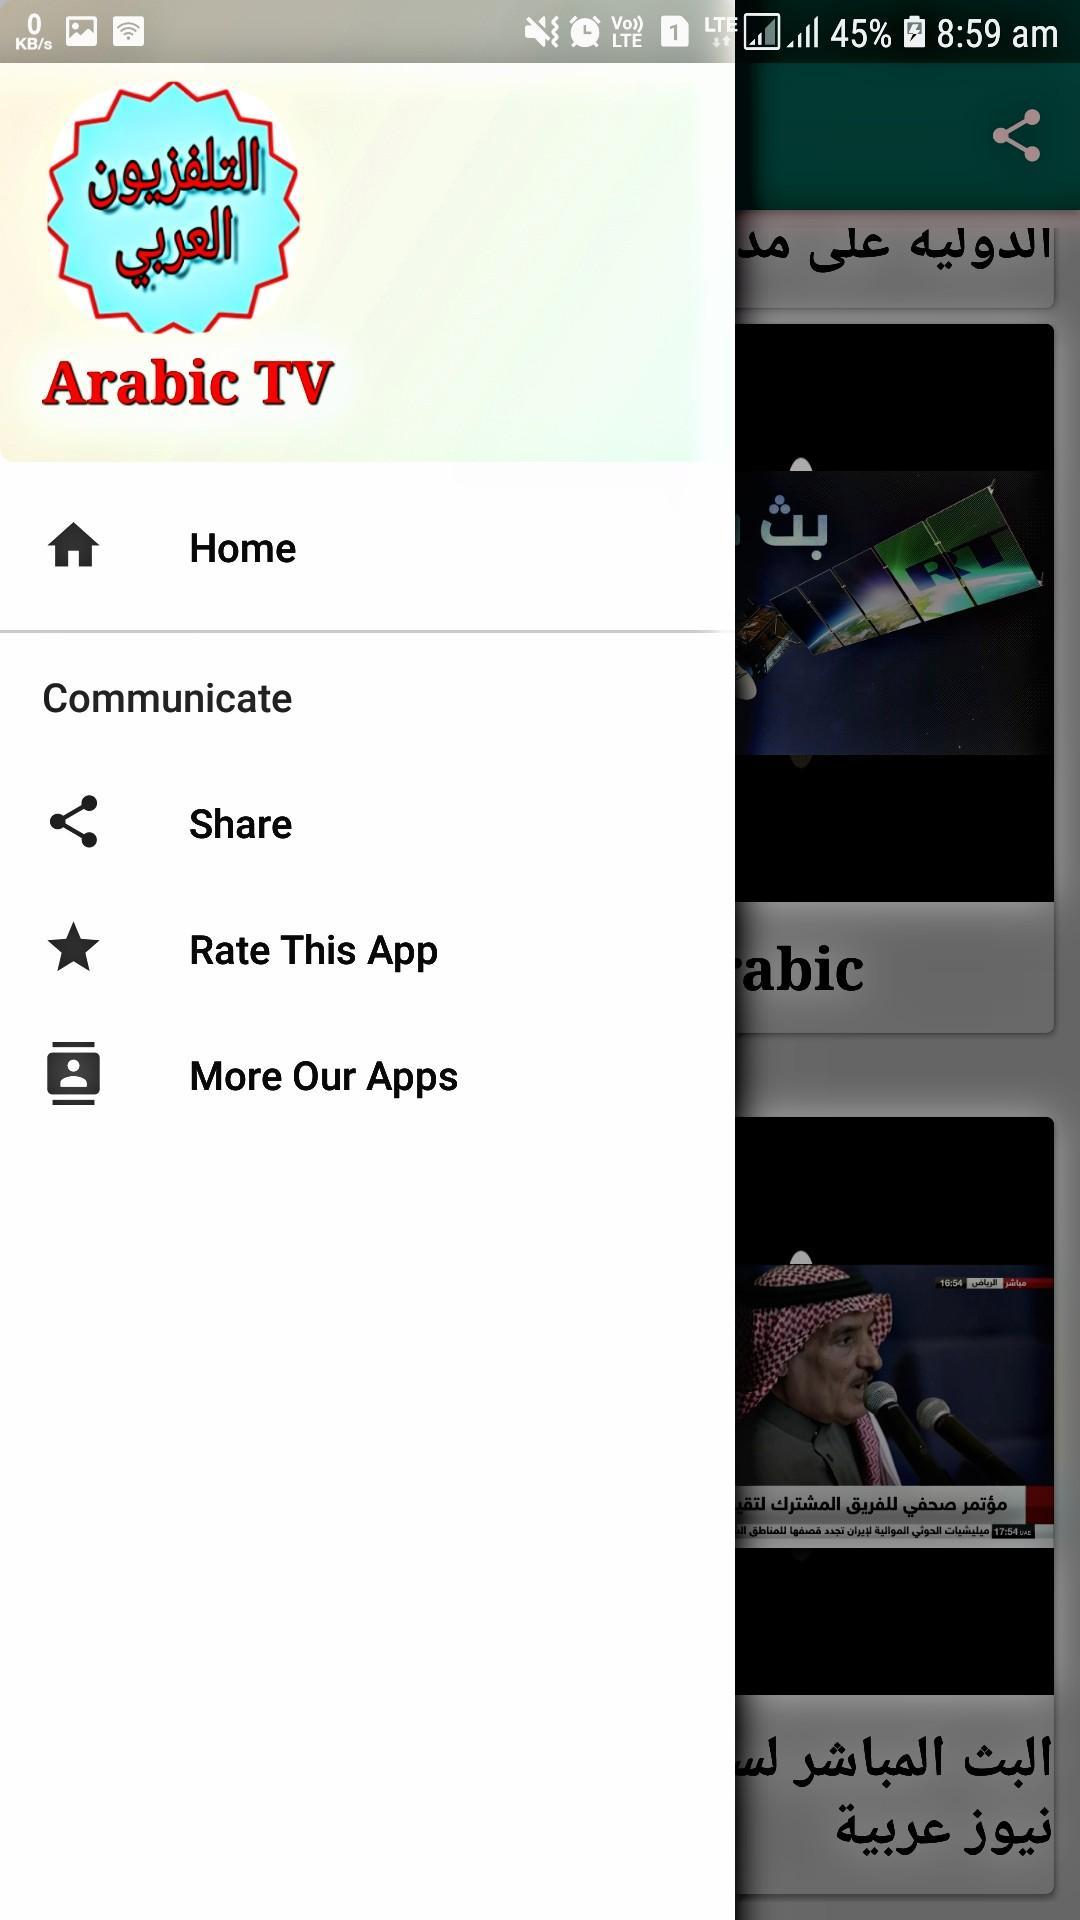 التلفزيون العربي - Arabic Live TV Free for Android - APK